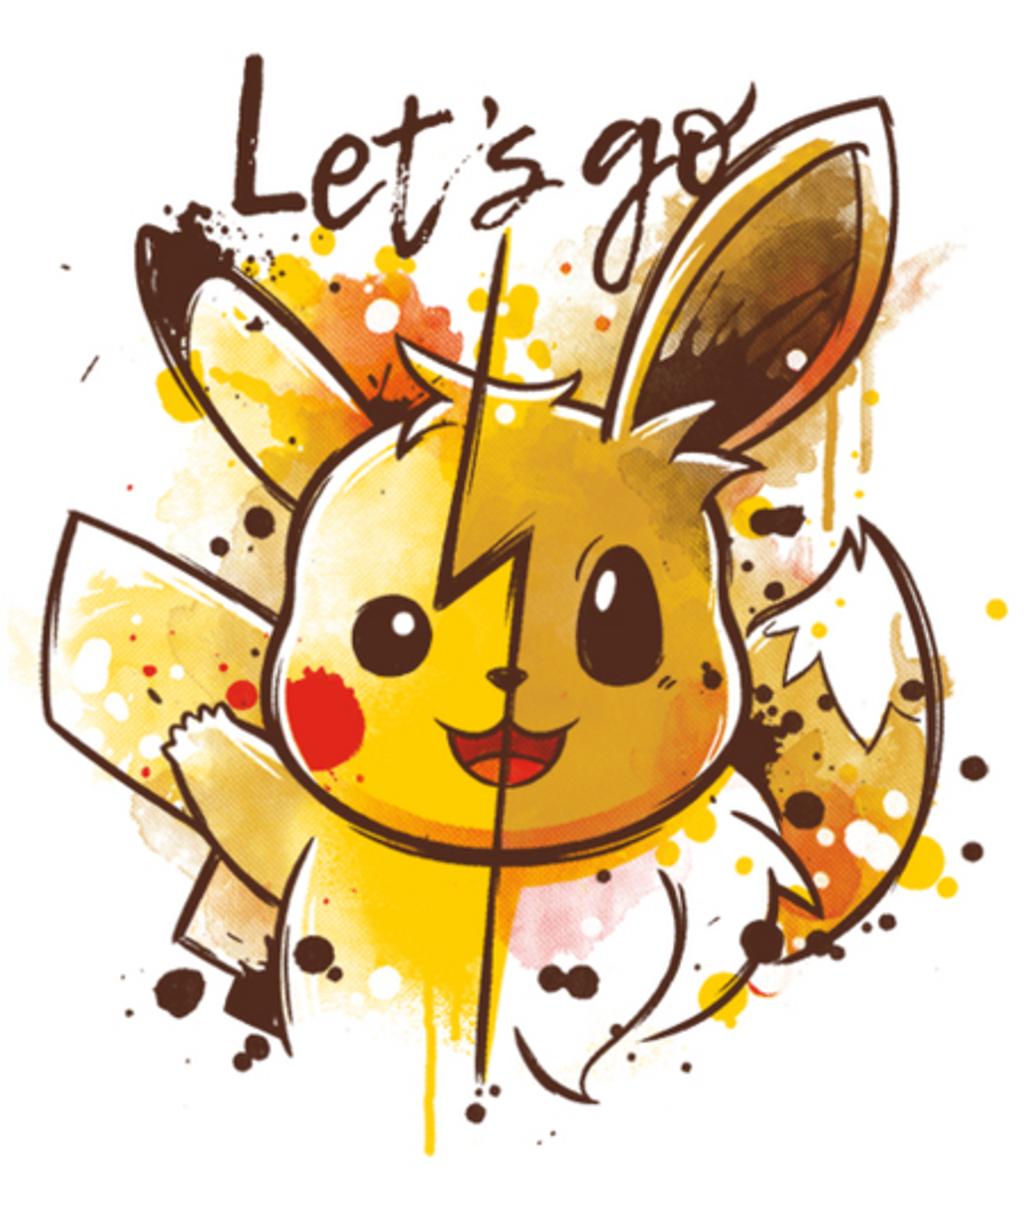 Qwertee: Let's go